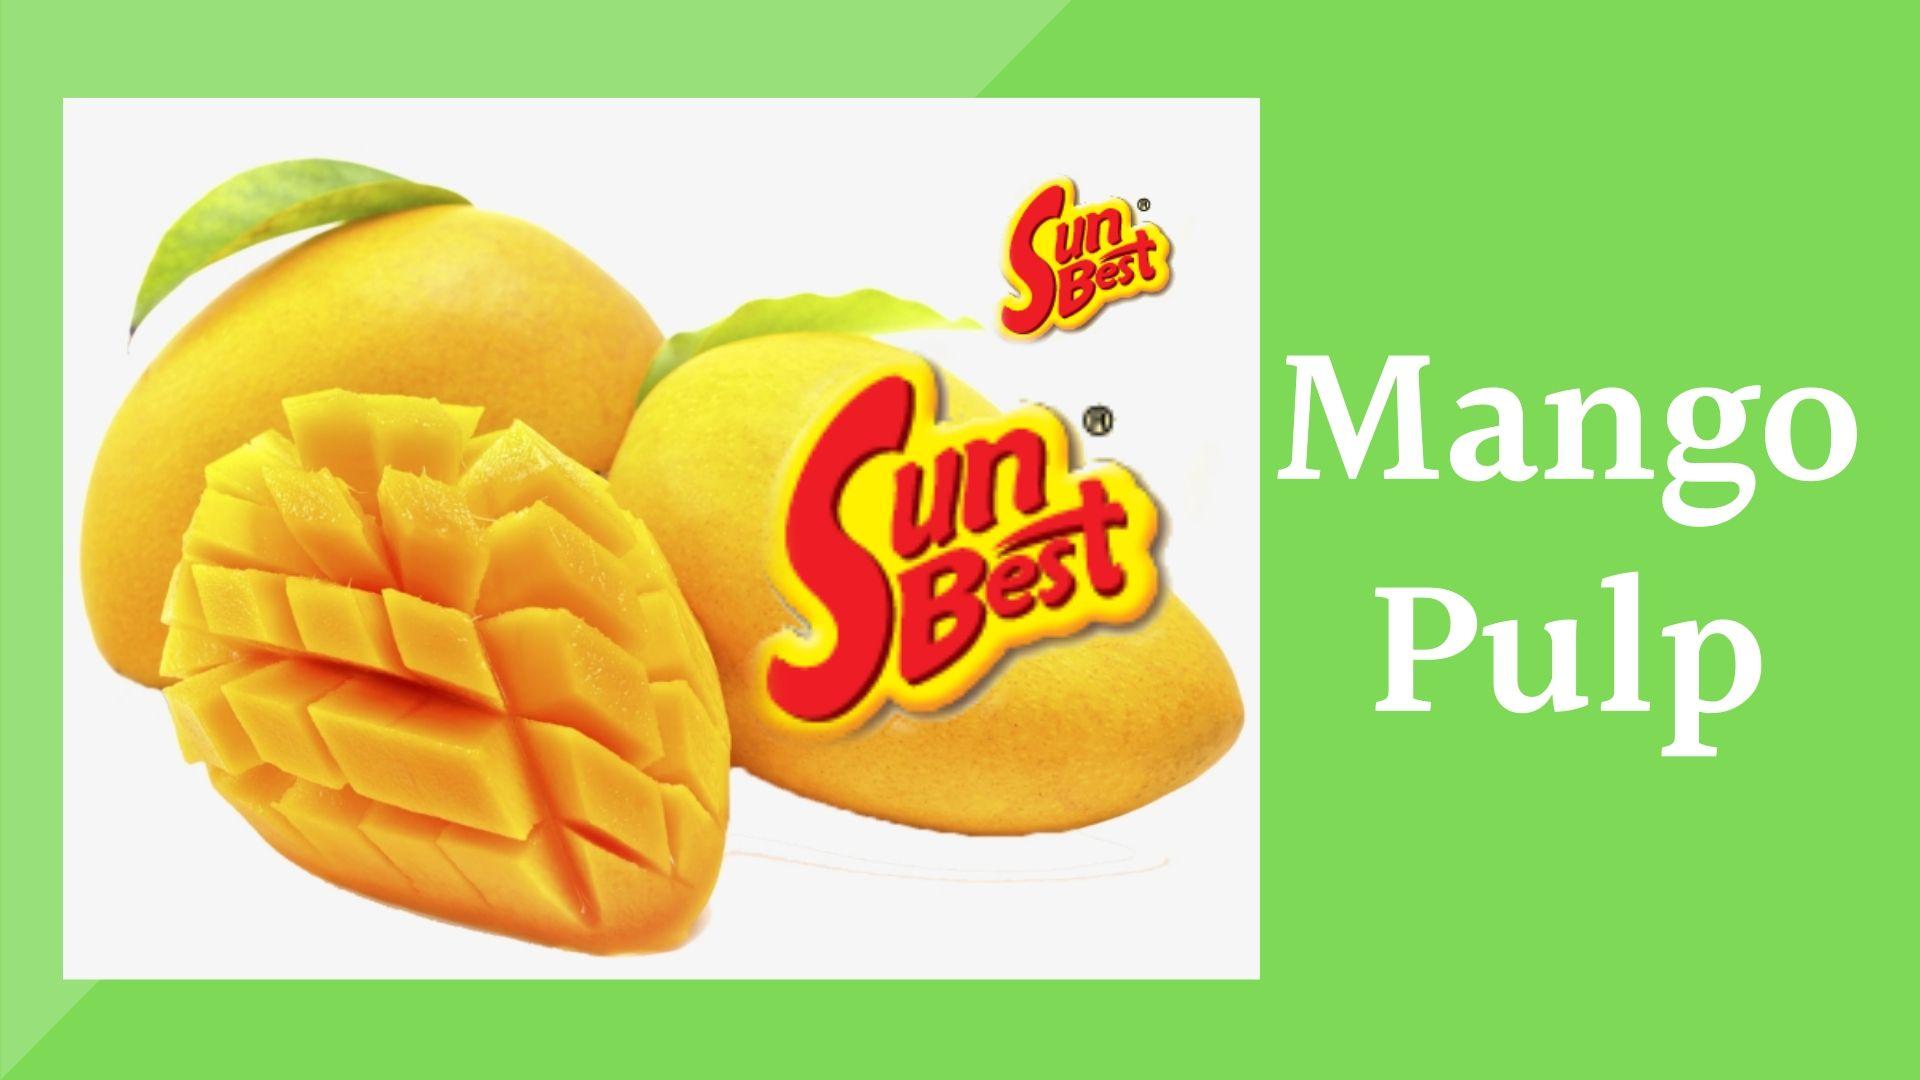 Sunbest Mango Pulp